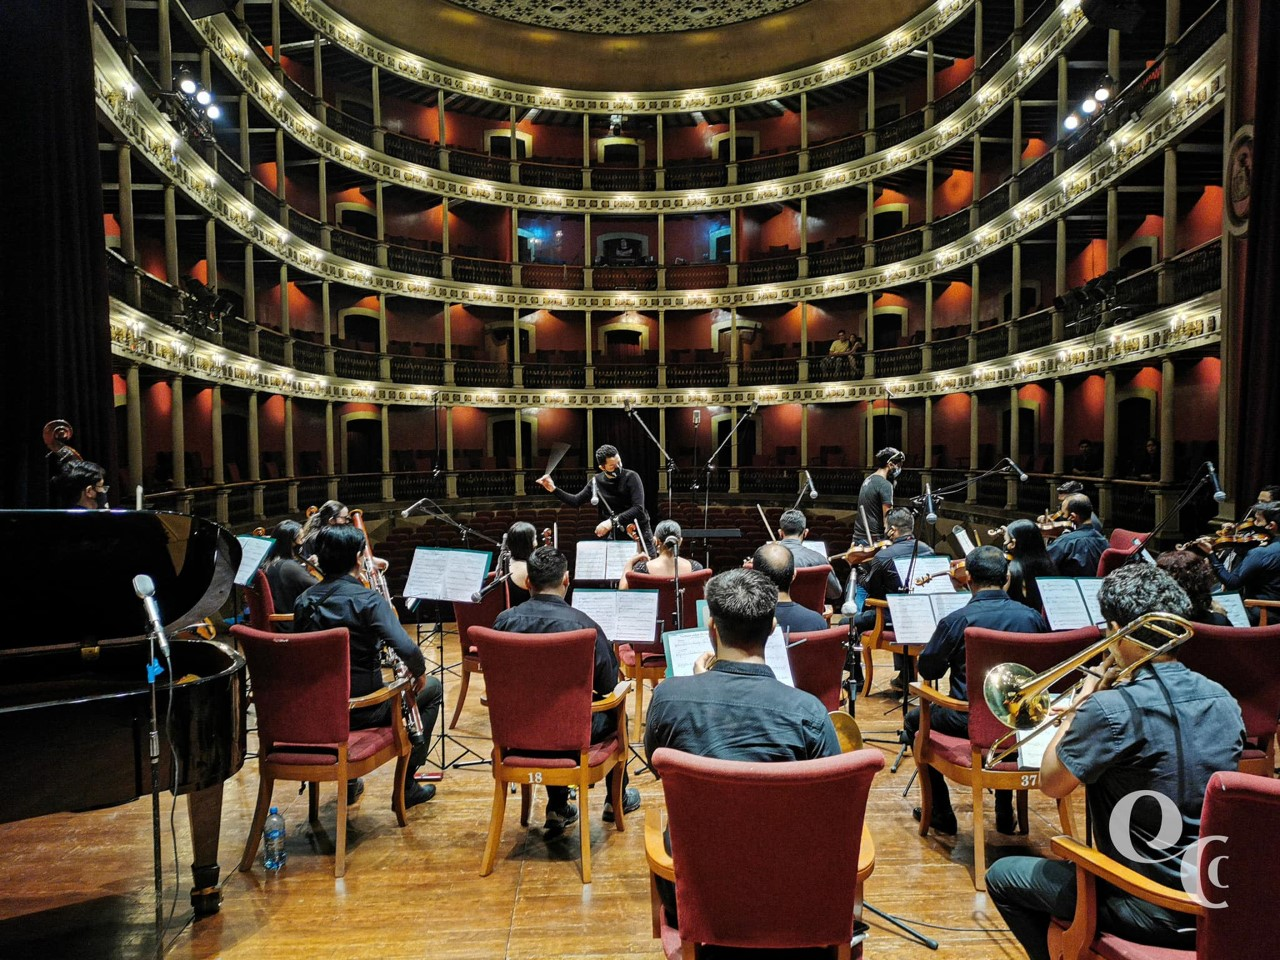 Transmitirán concierto de Orquesta de Cámara Colimense este sábado